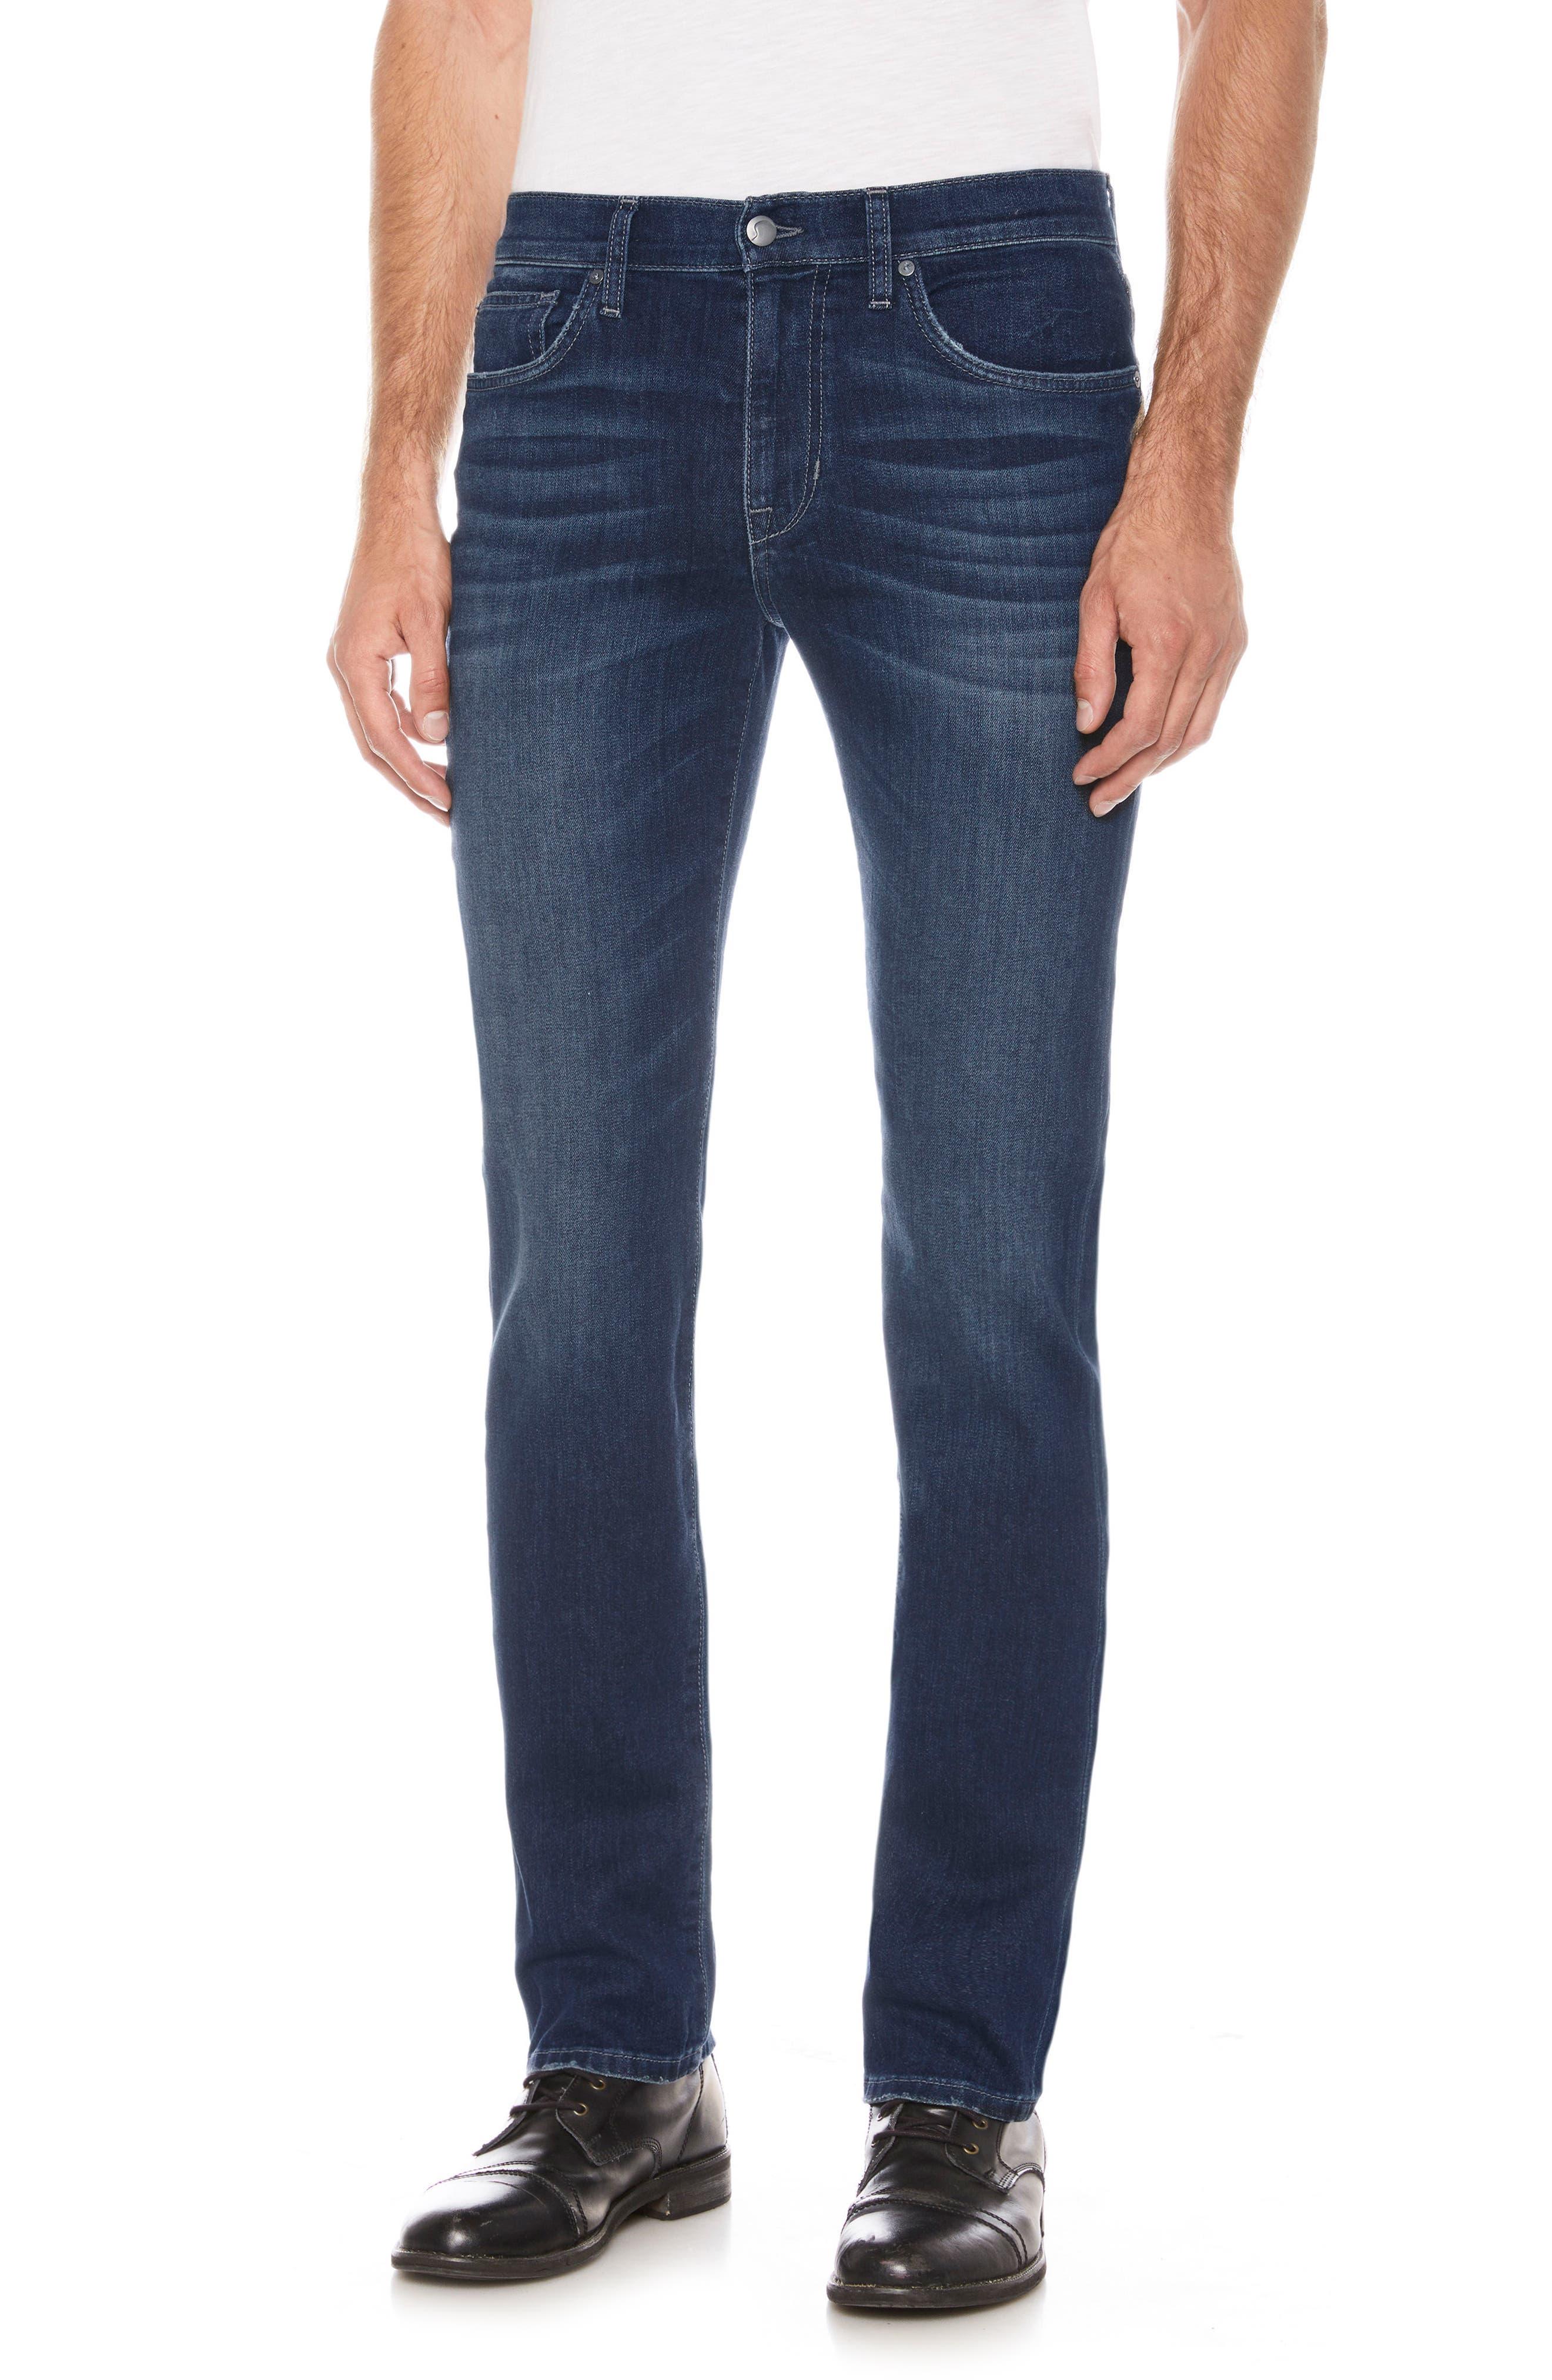 Brixton Slim Straight Leg Jeans,                         Main,                         color, SANDERS